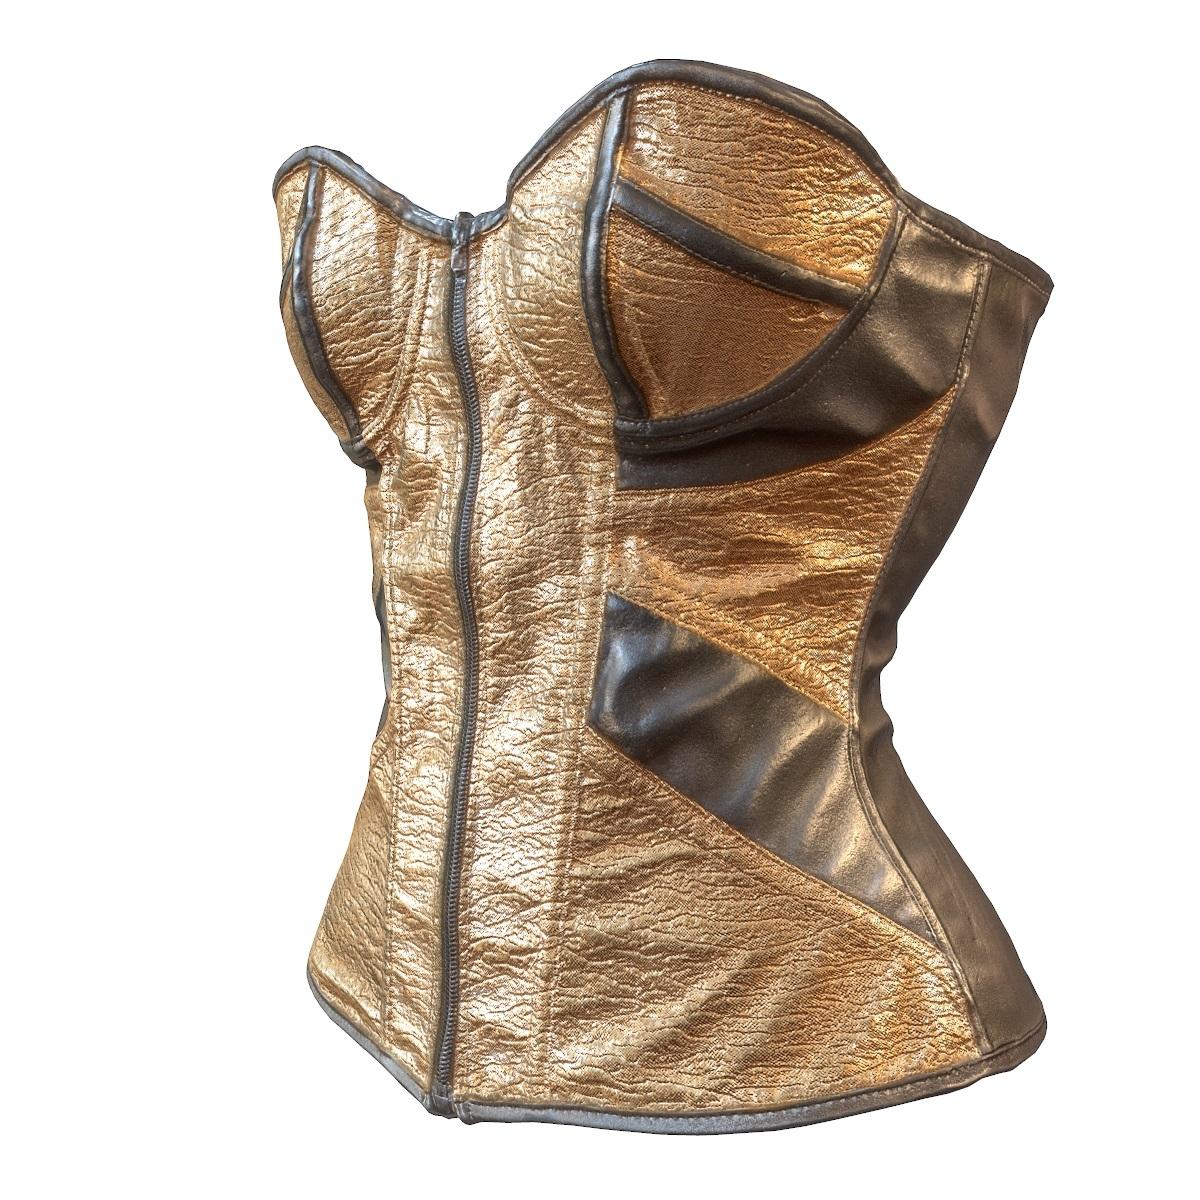 Korsetts & Corsagen in Gold für Frauen. Damenmode in Gold